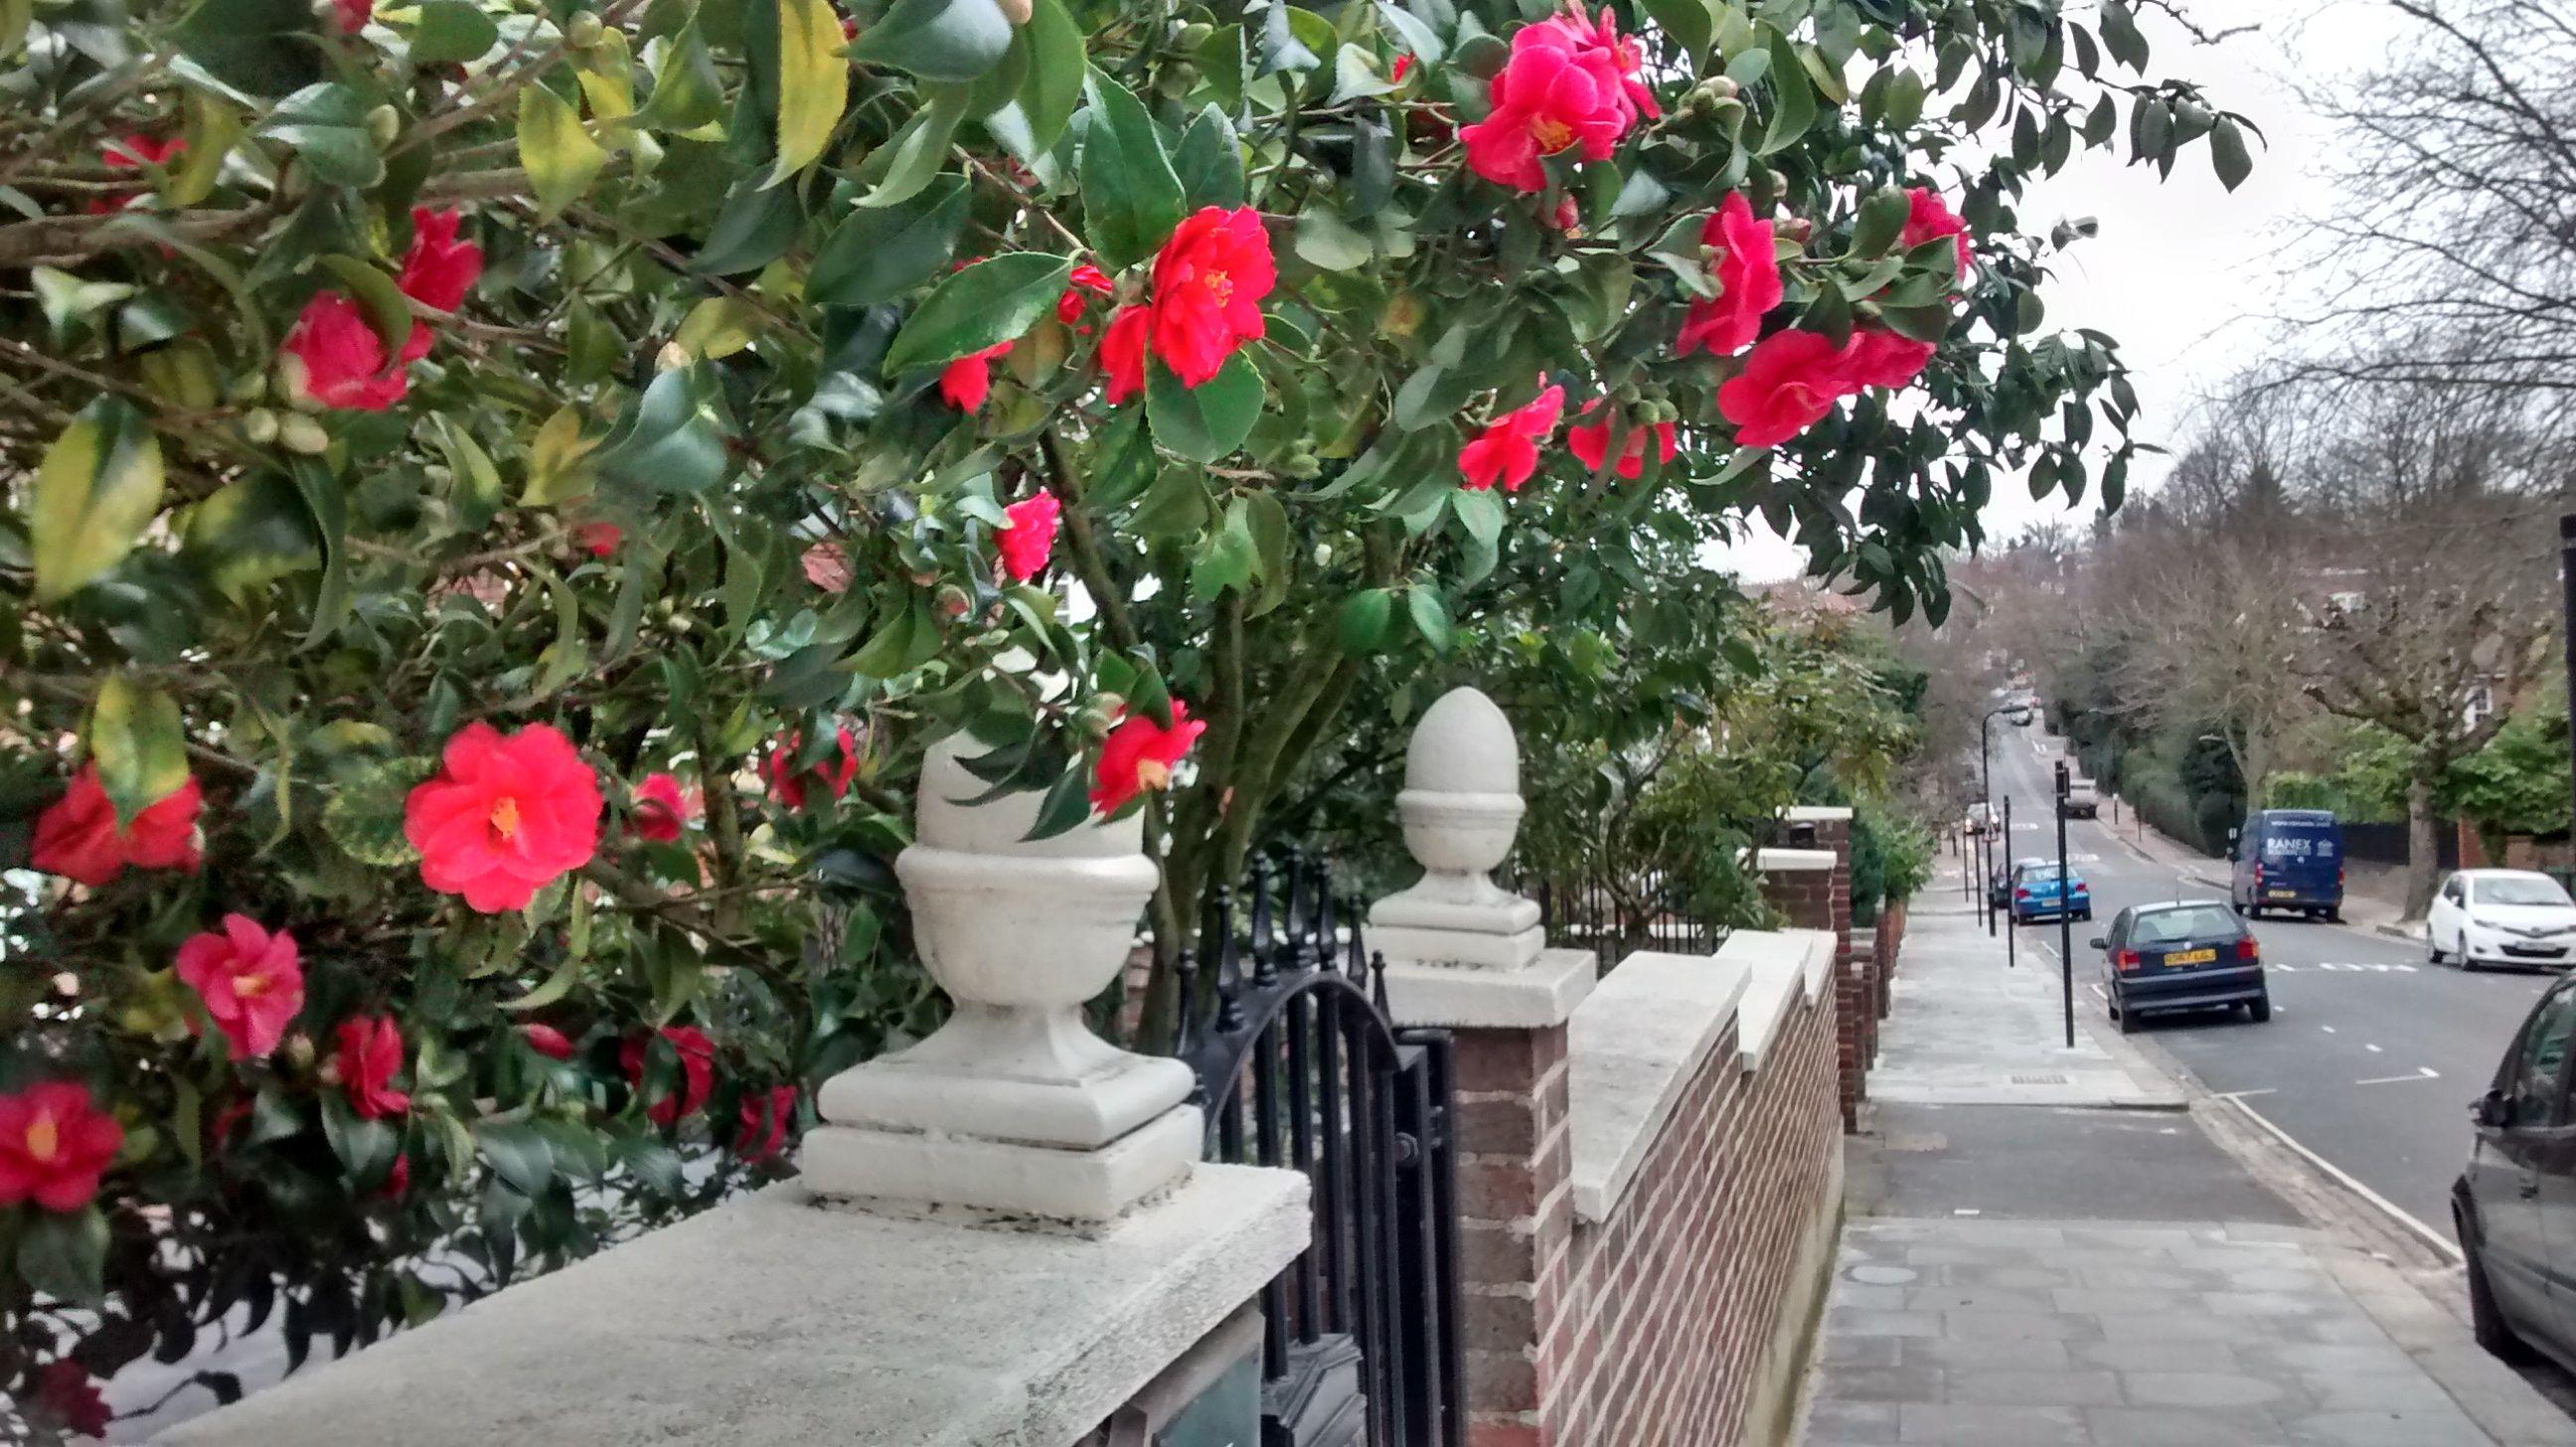 Spring flowers at liberty in london camellias in bloom in londons hampstead neighborhood mightylinksfo